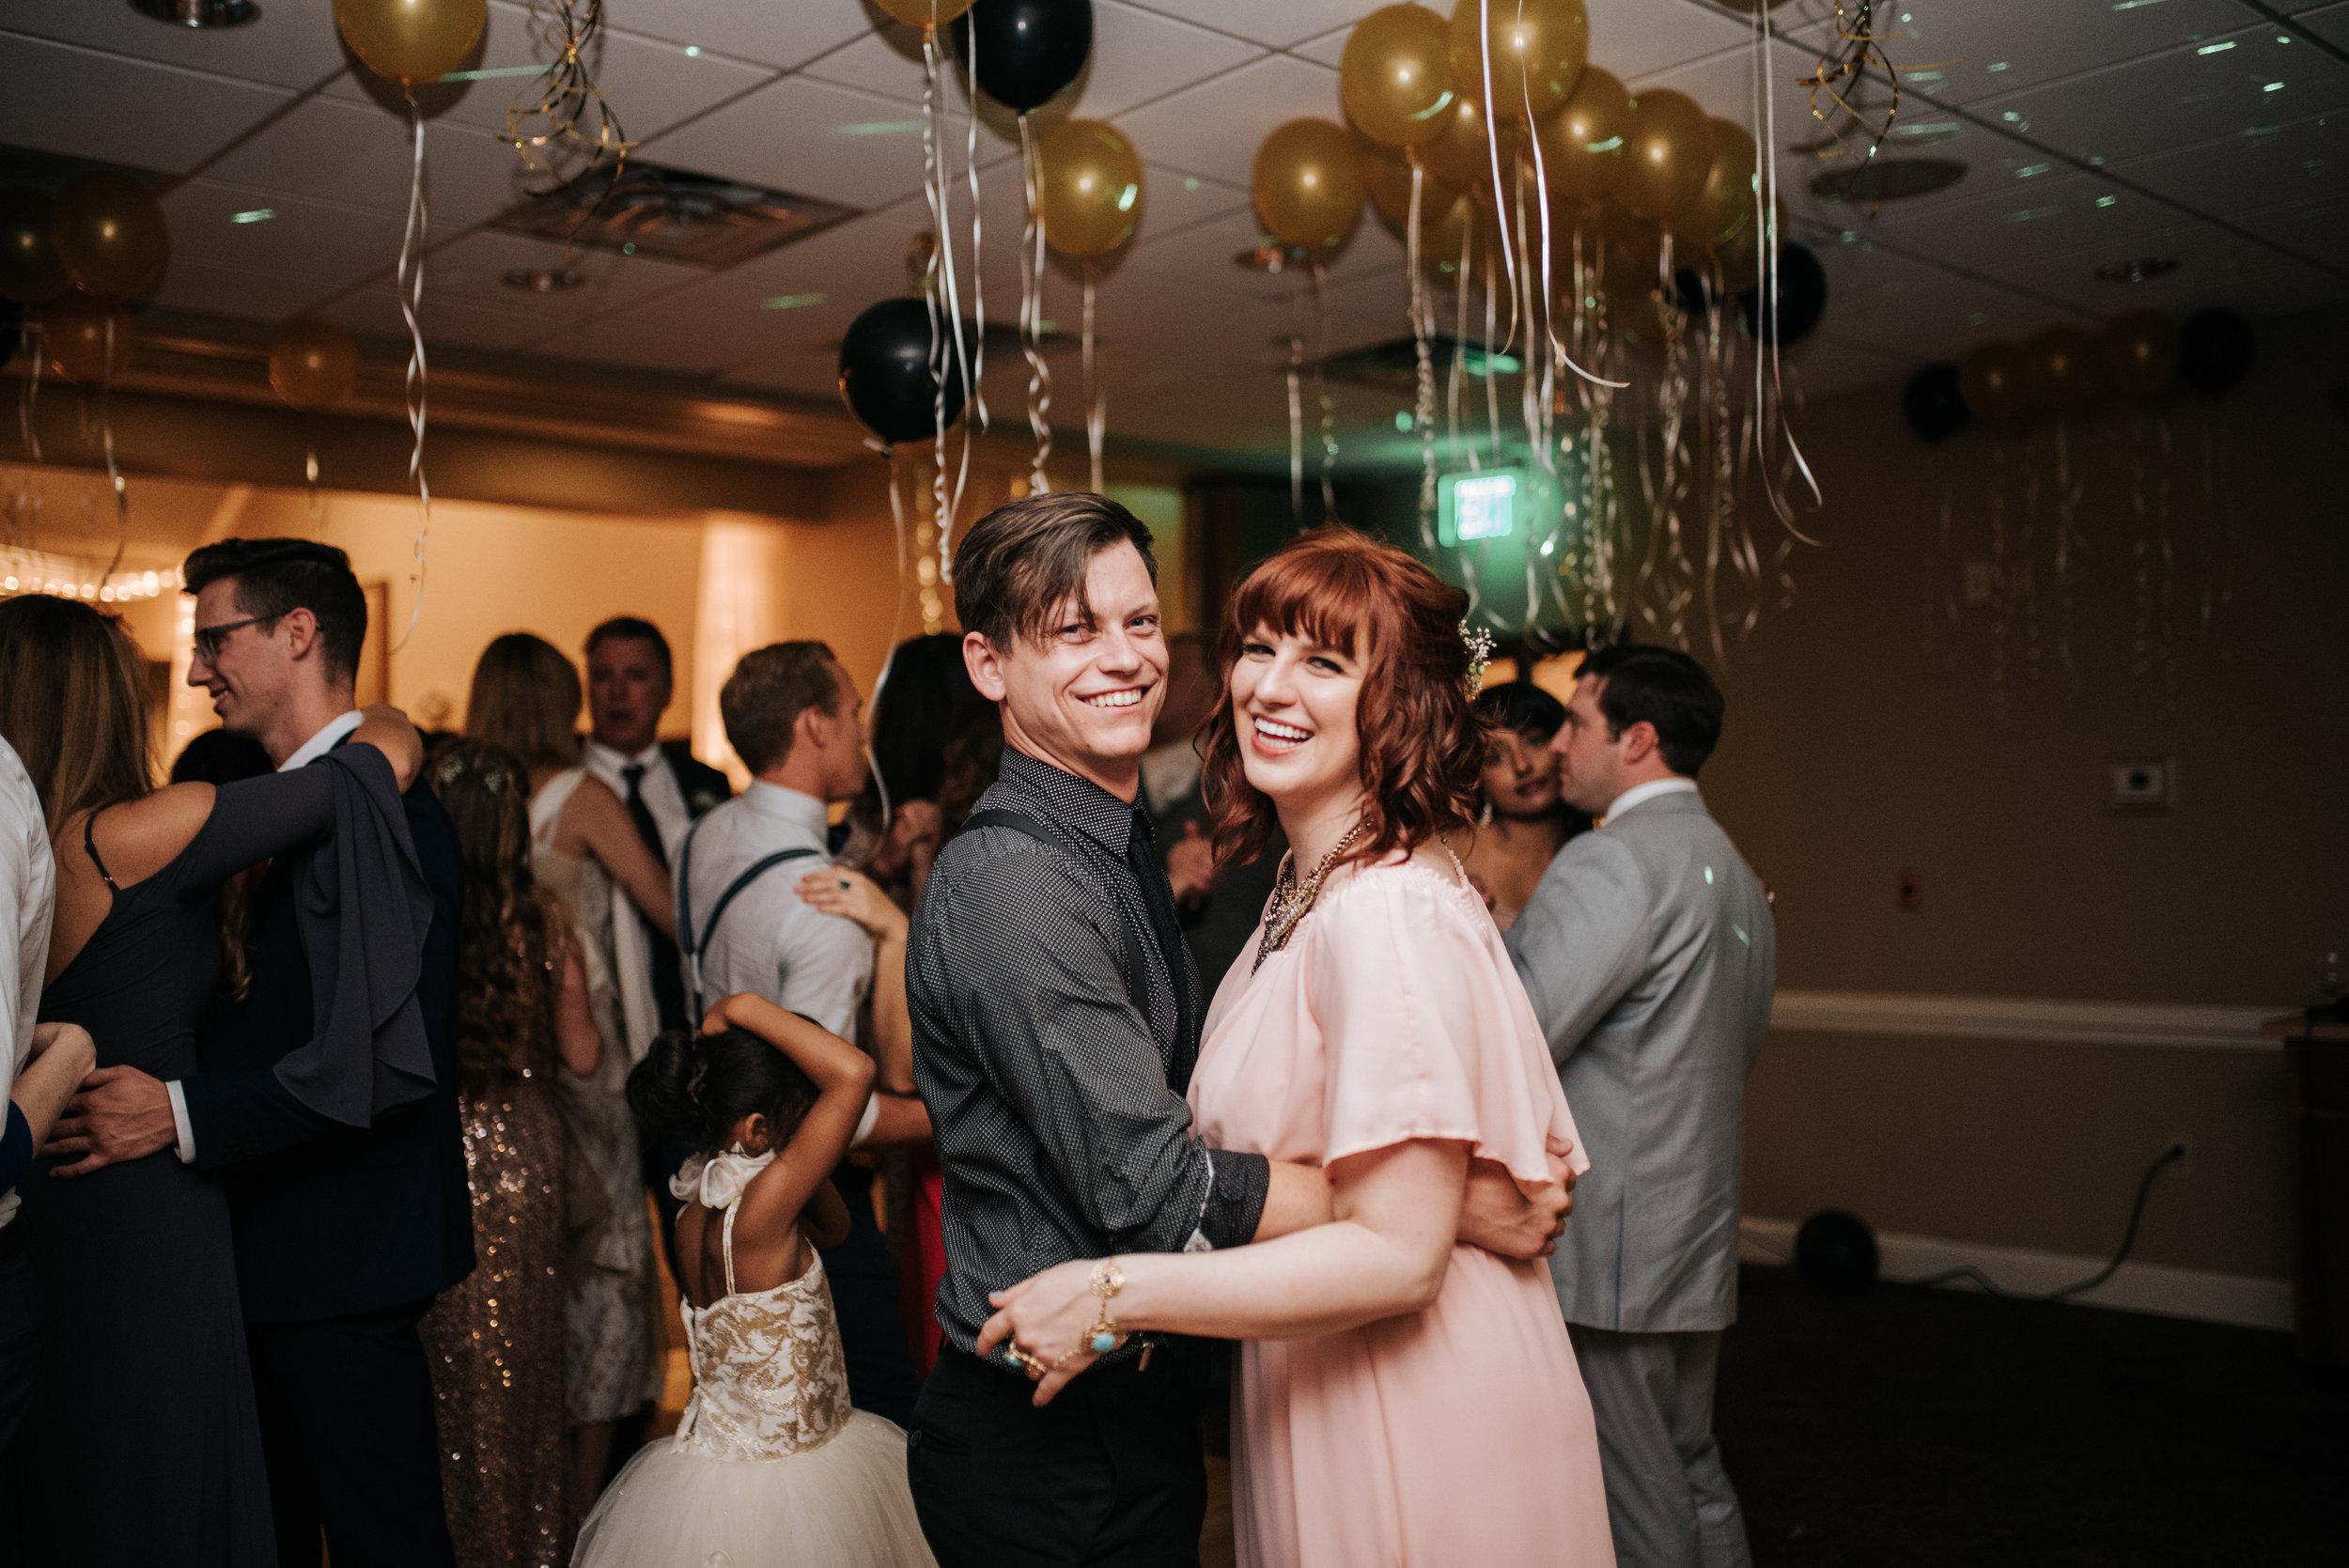 zayda-collin-panama-city-wedding-photography-trippy-bohemian-lisa-frank-wedding-dancing-party-61.jpg